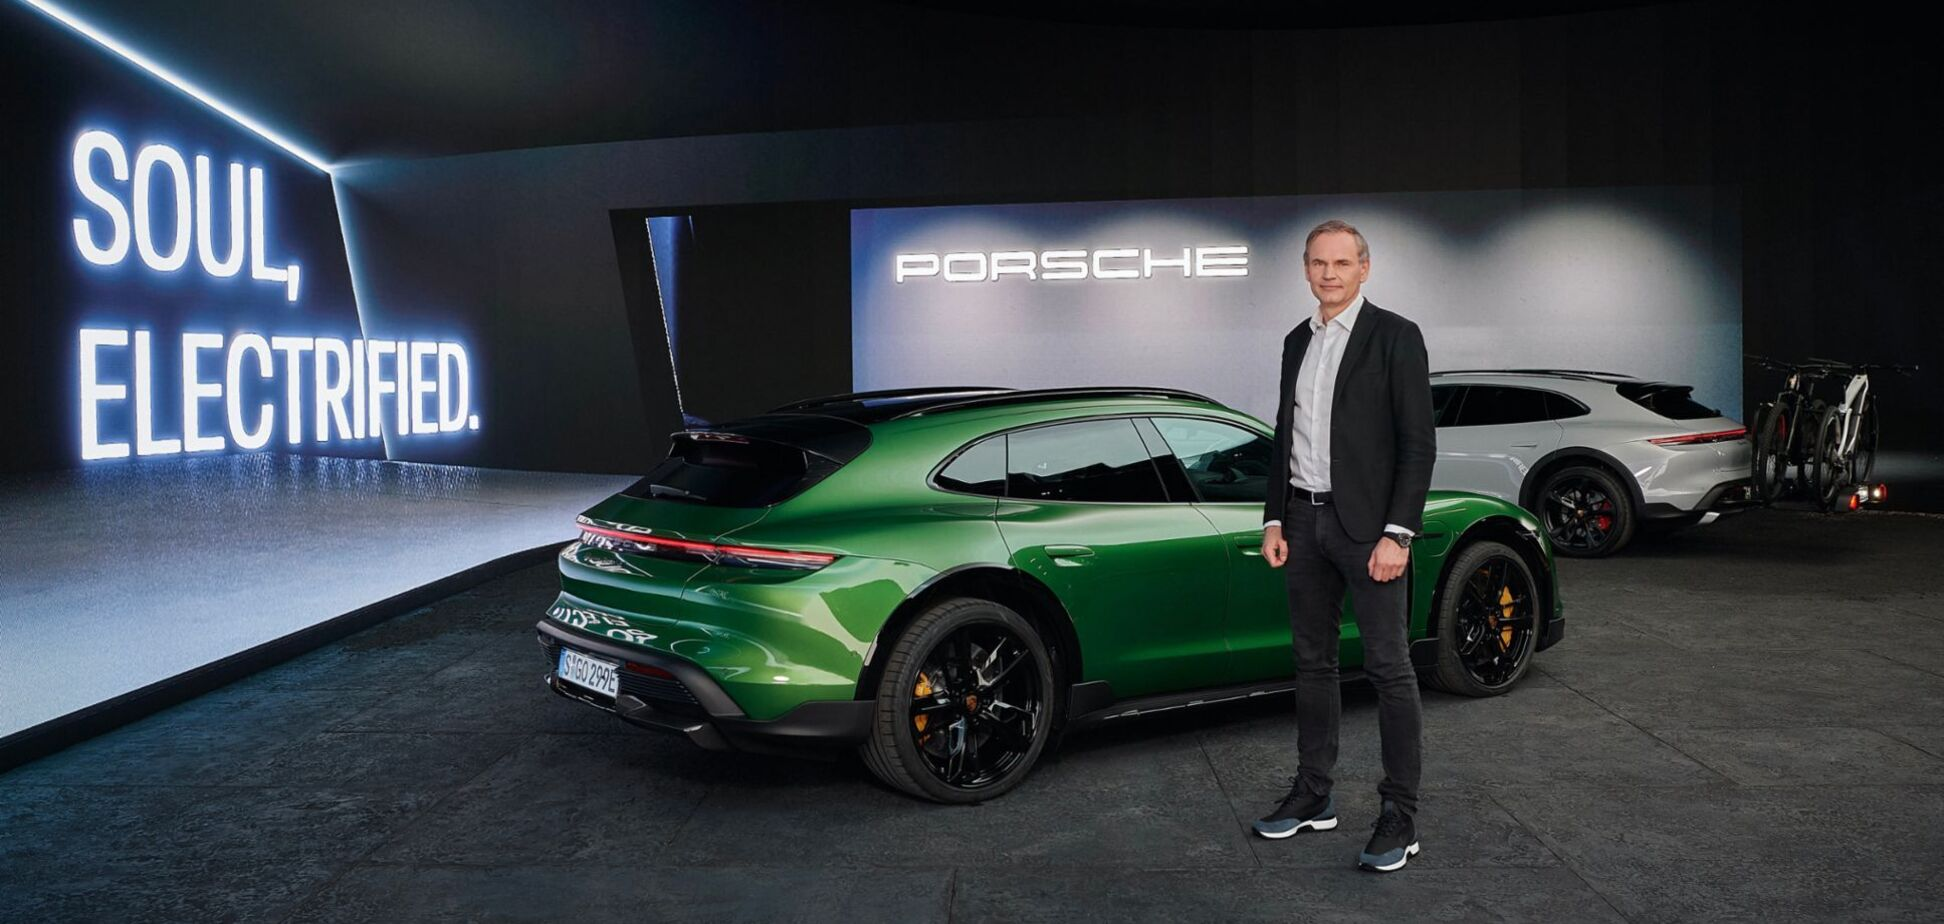 Генеральний директор Porsche Олівер Блюм